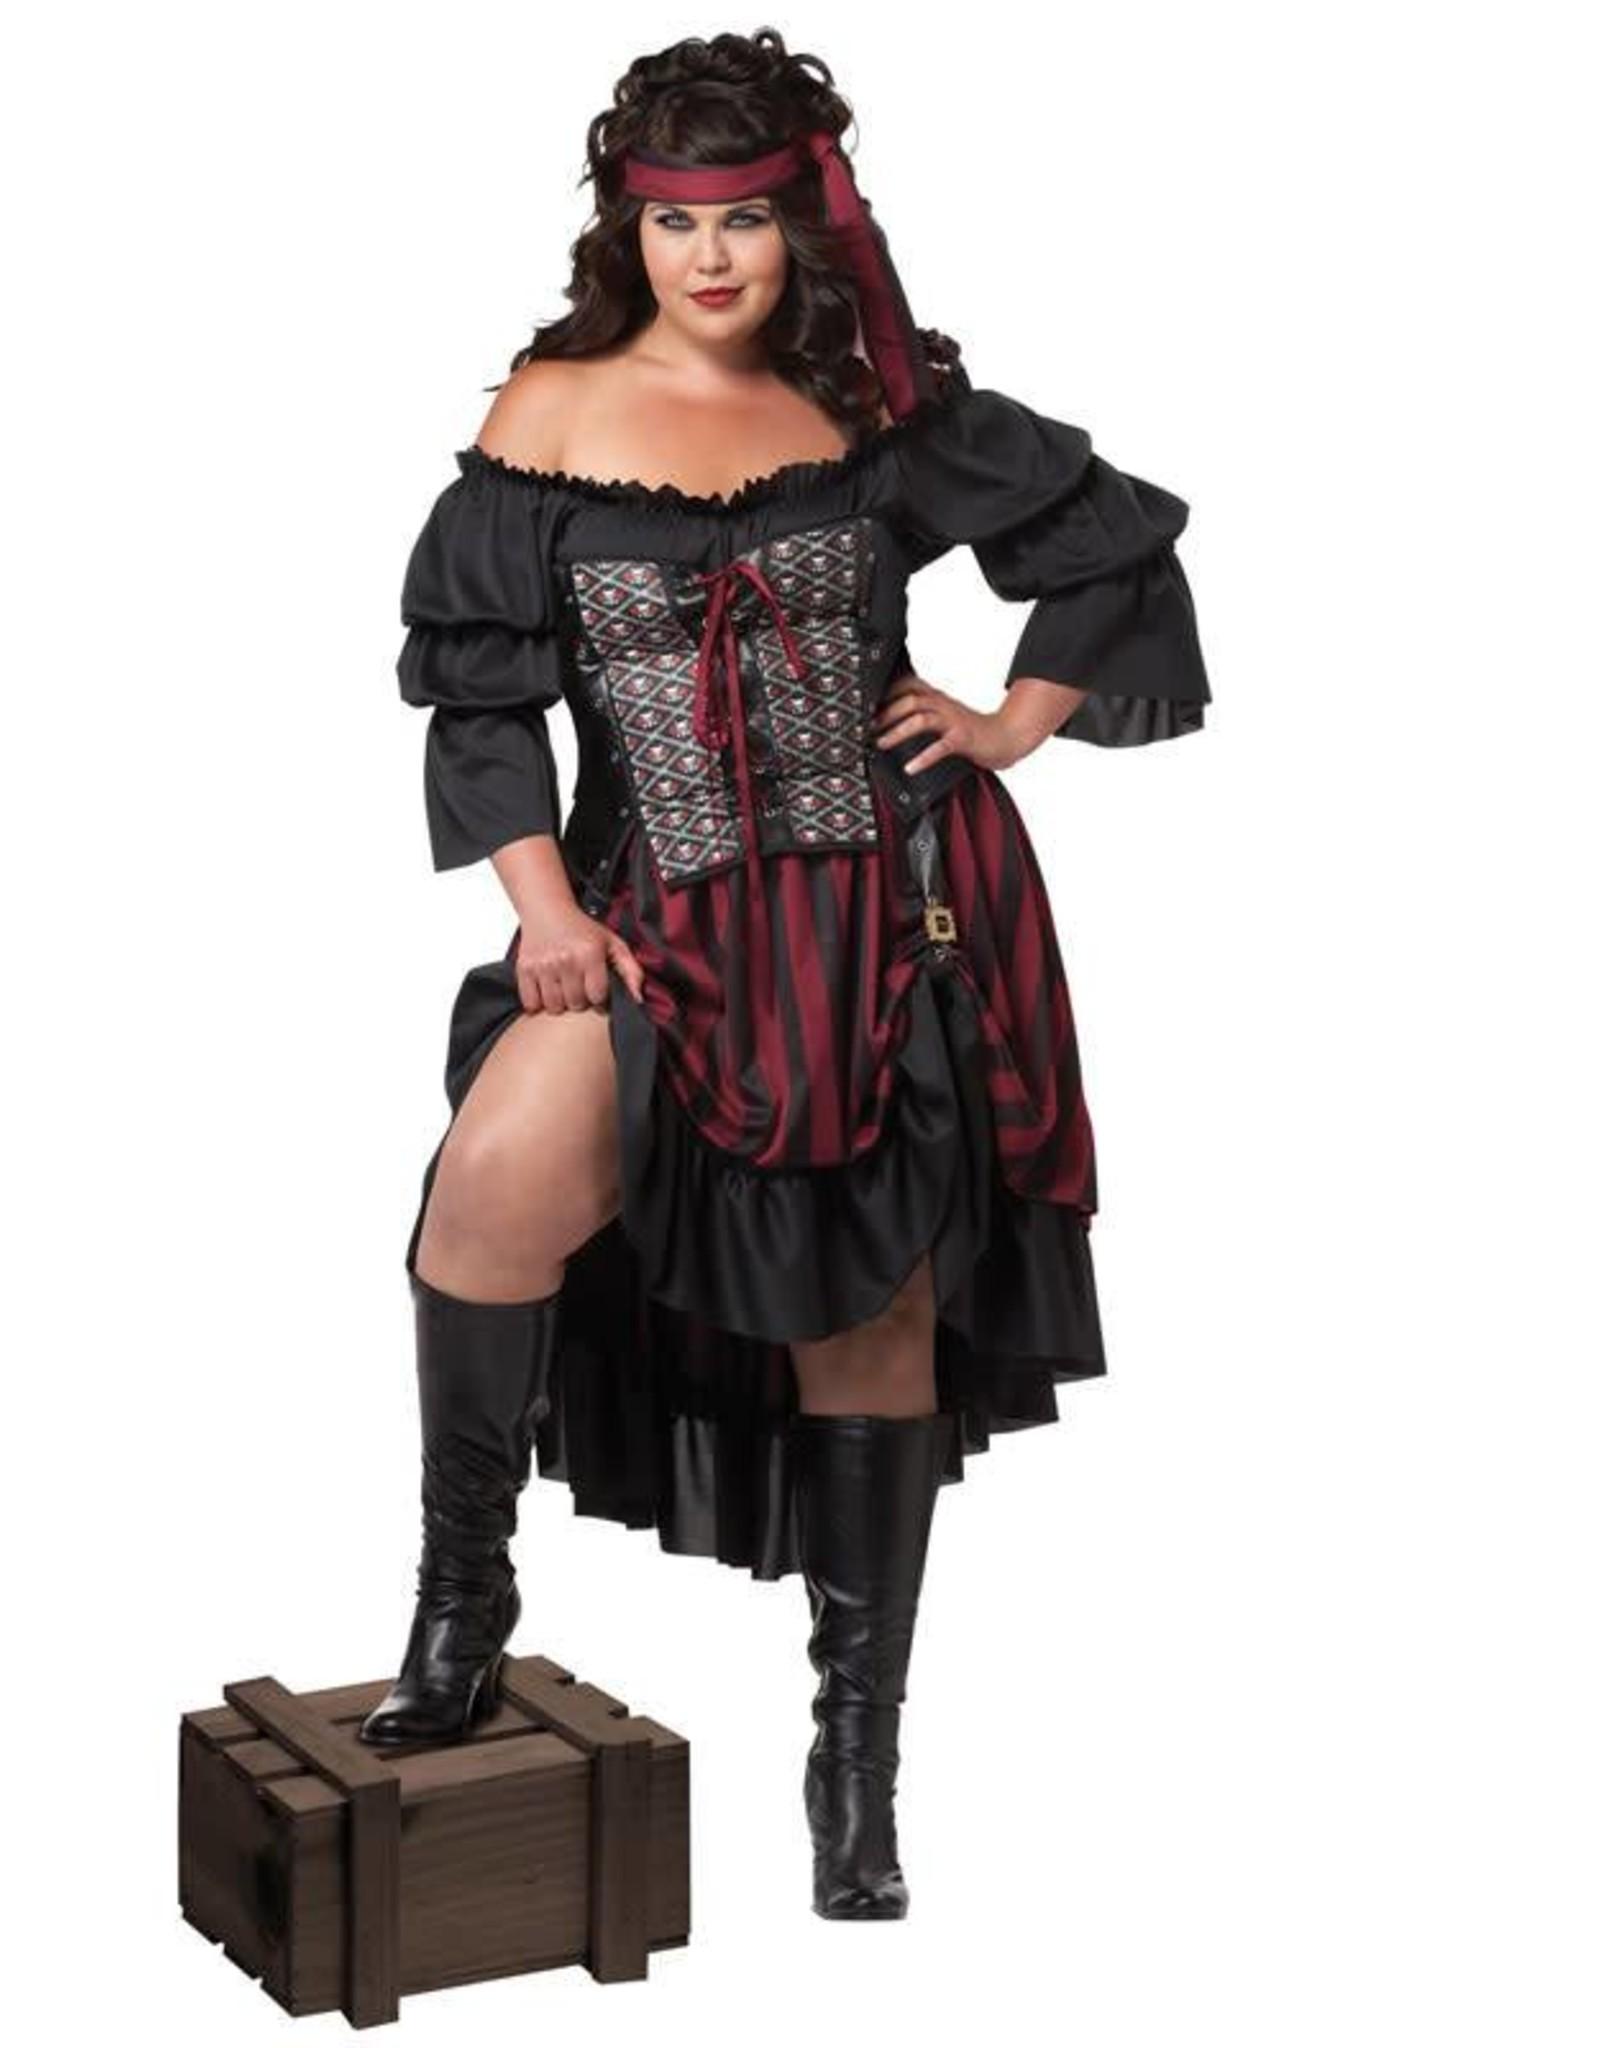 California Costume Pirate Wench 1XL (16-18)